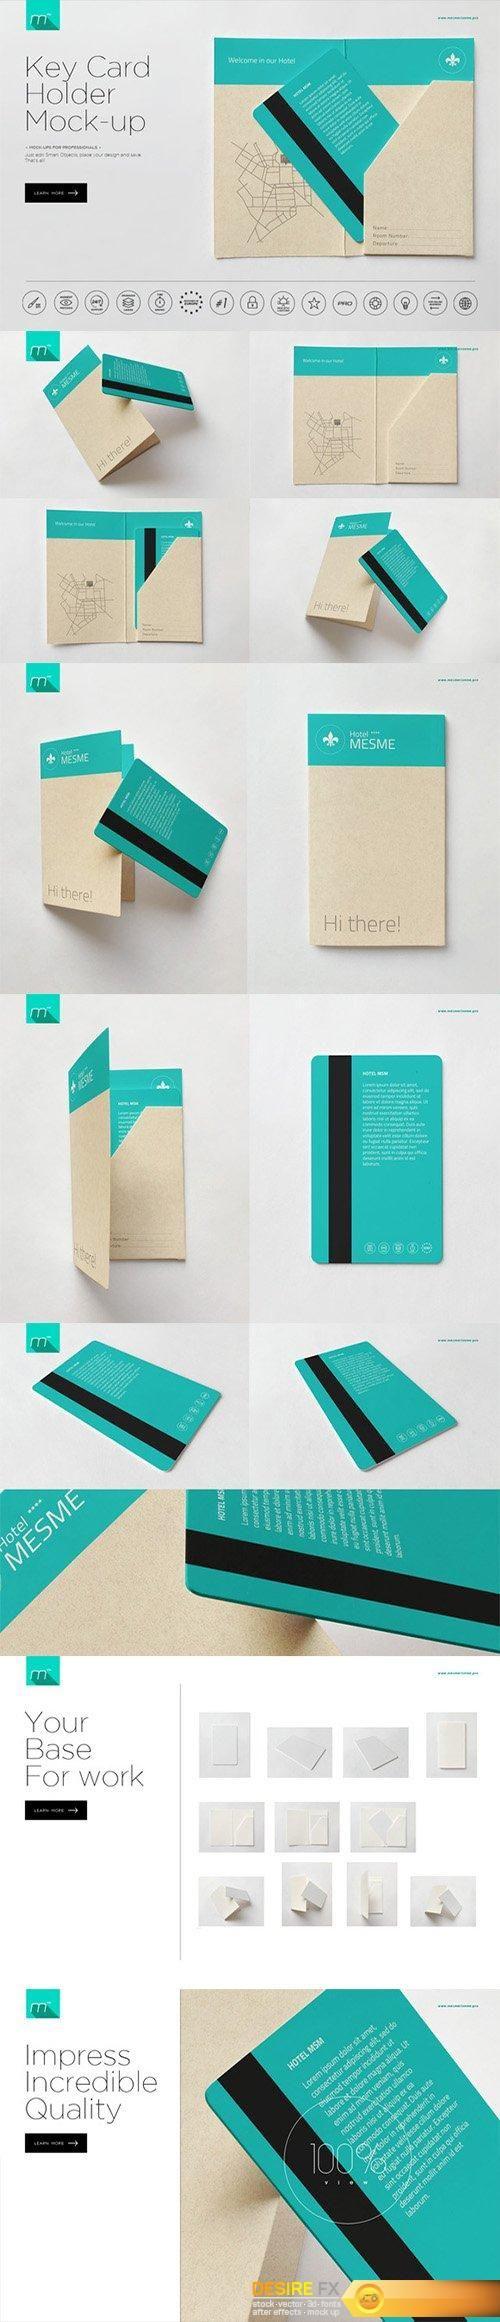 Hotel key cards – Artofit